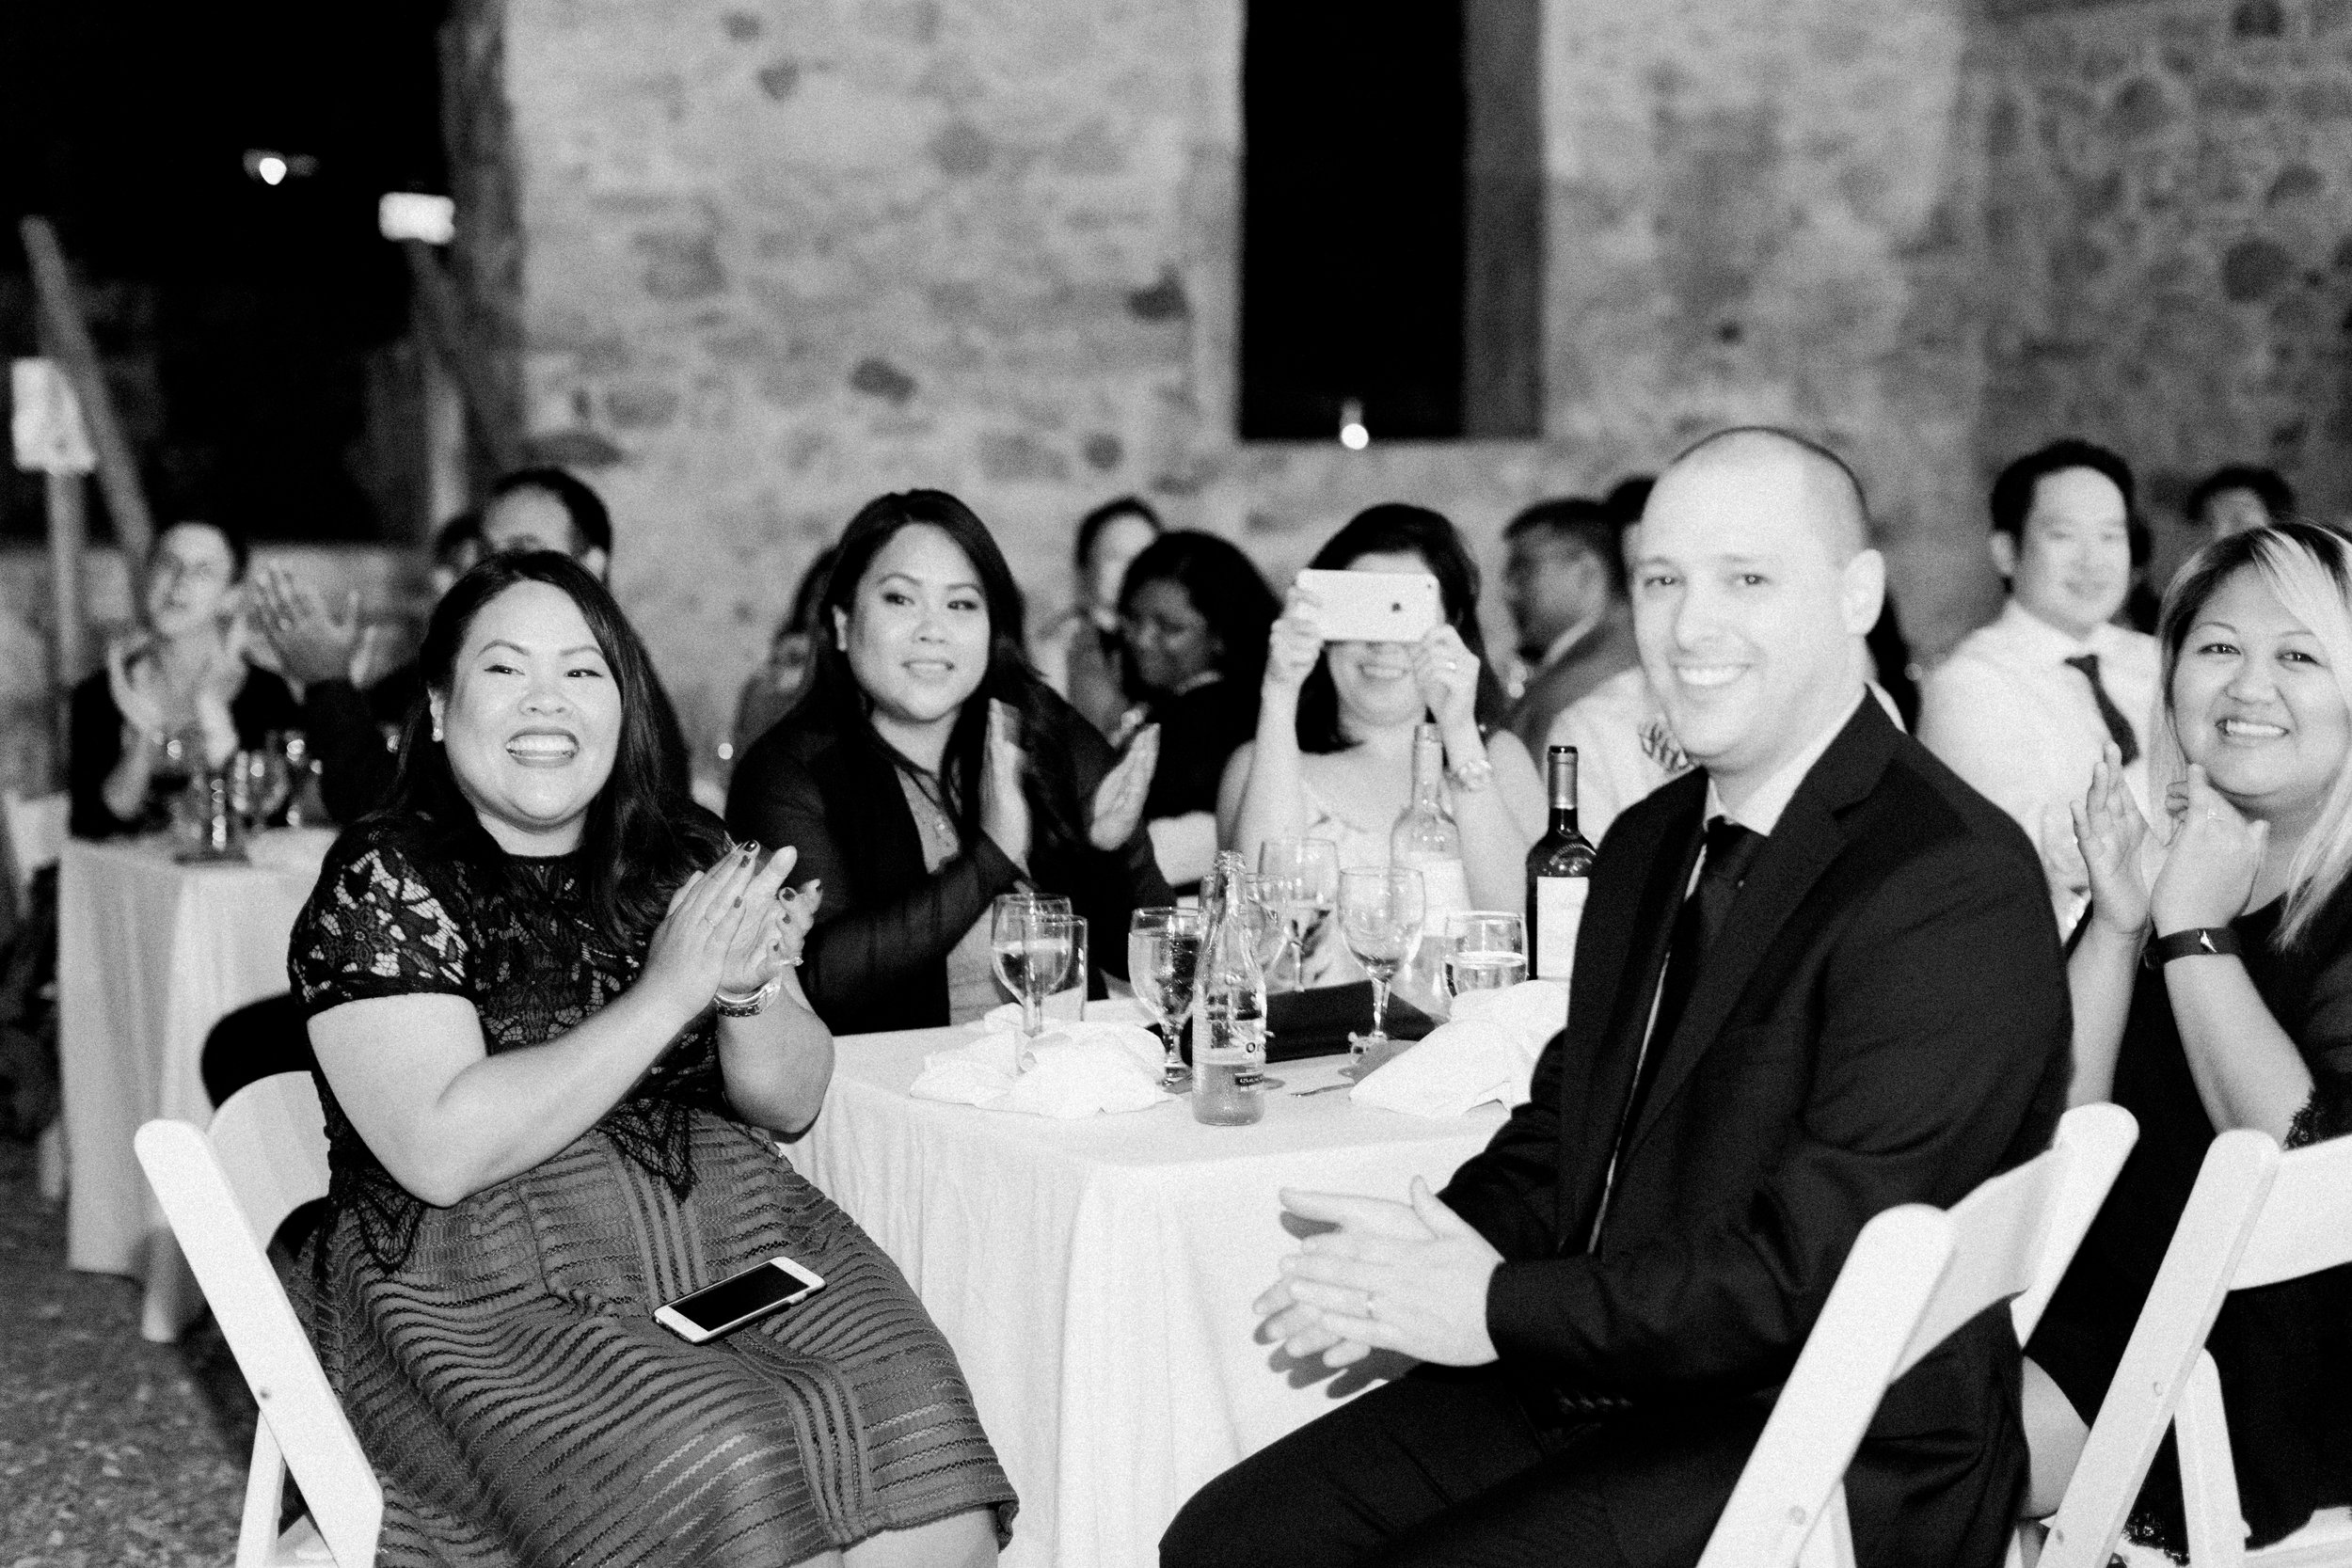 Alton Mills Wedding - Reception-131.jpg